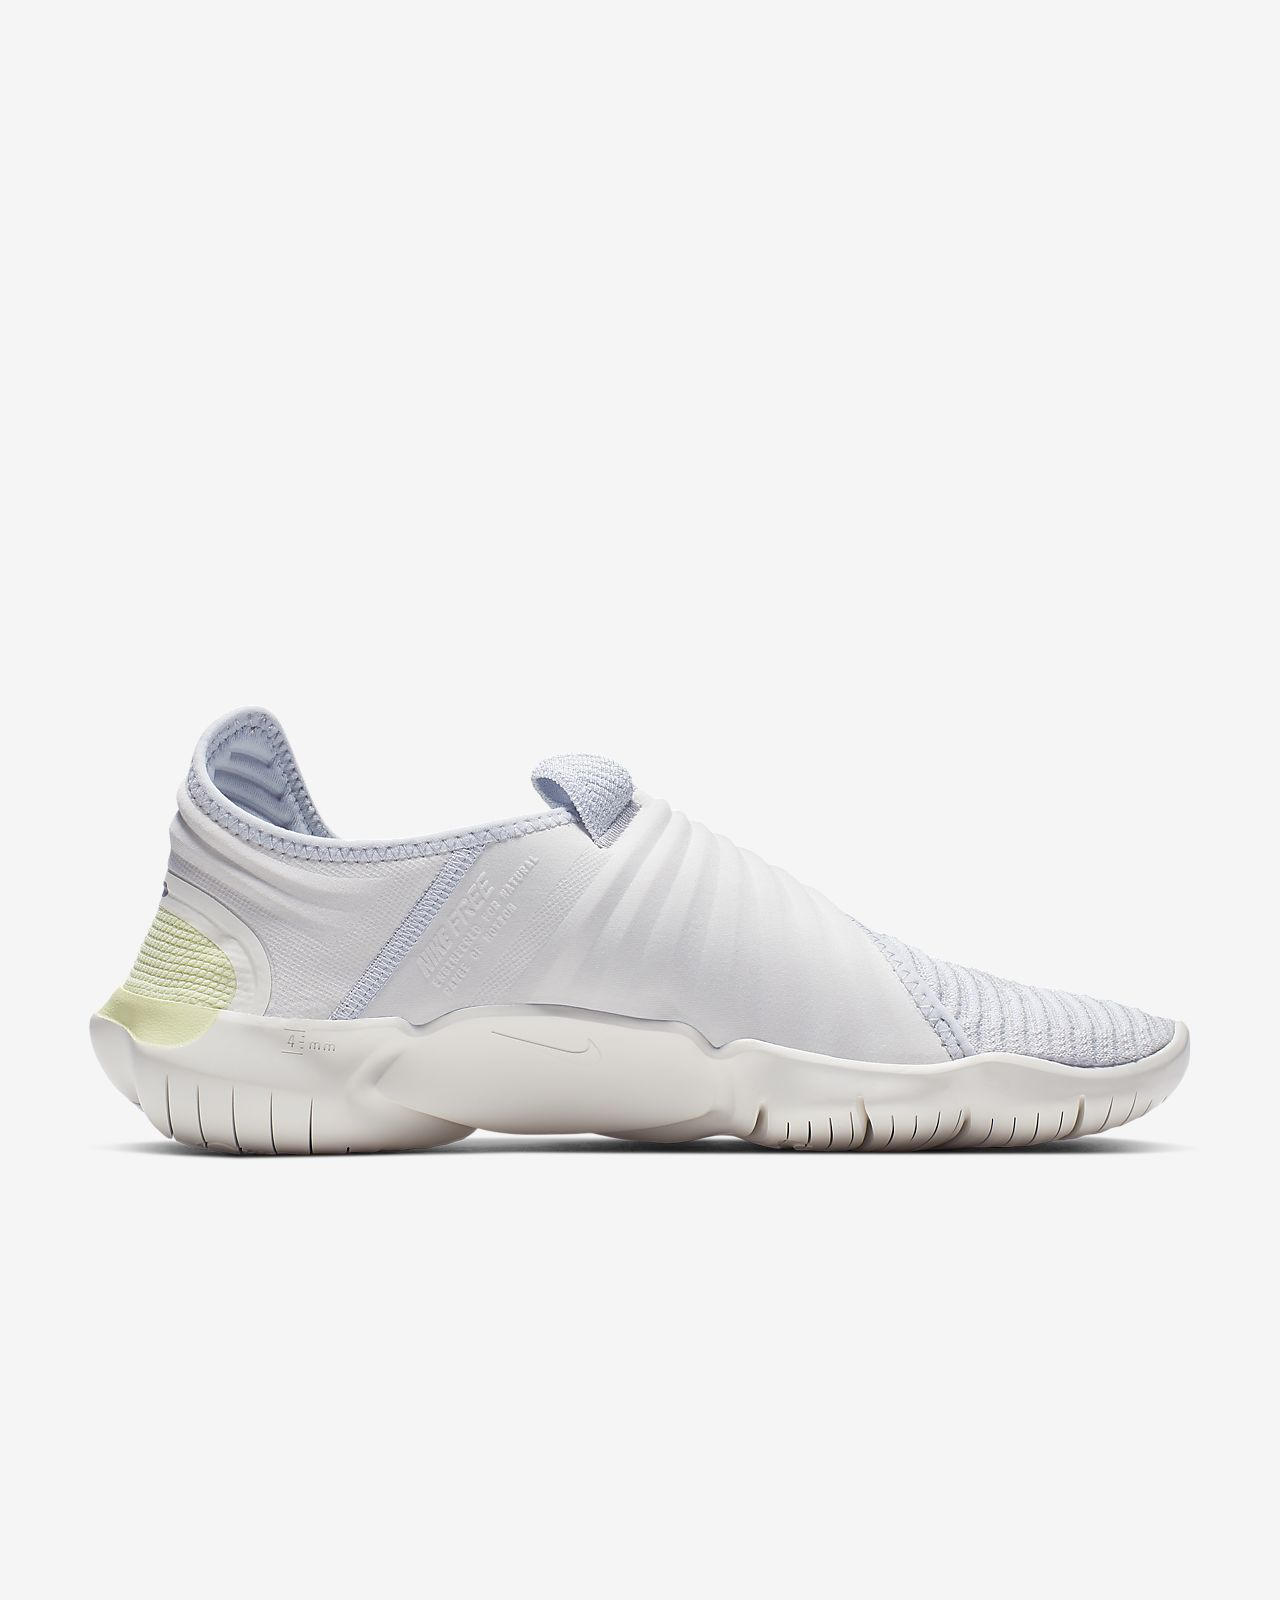 official photos 1e948 05623 ... Nike Free RN Flyknit 3.0 Men s Running Shoe